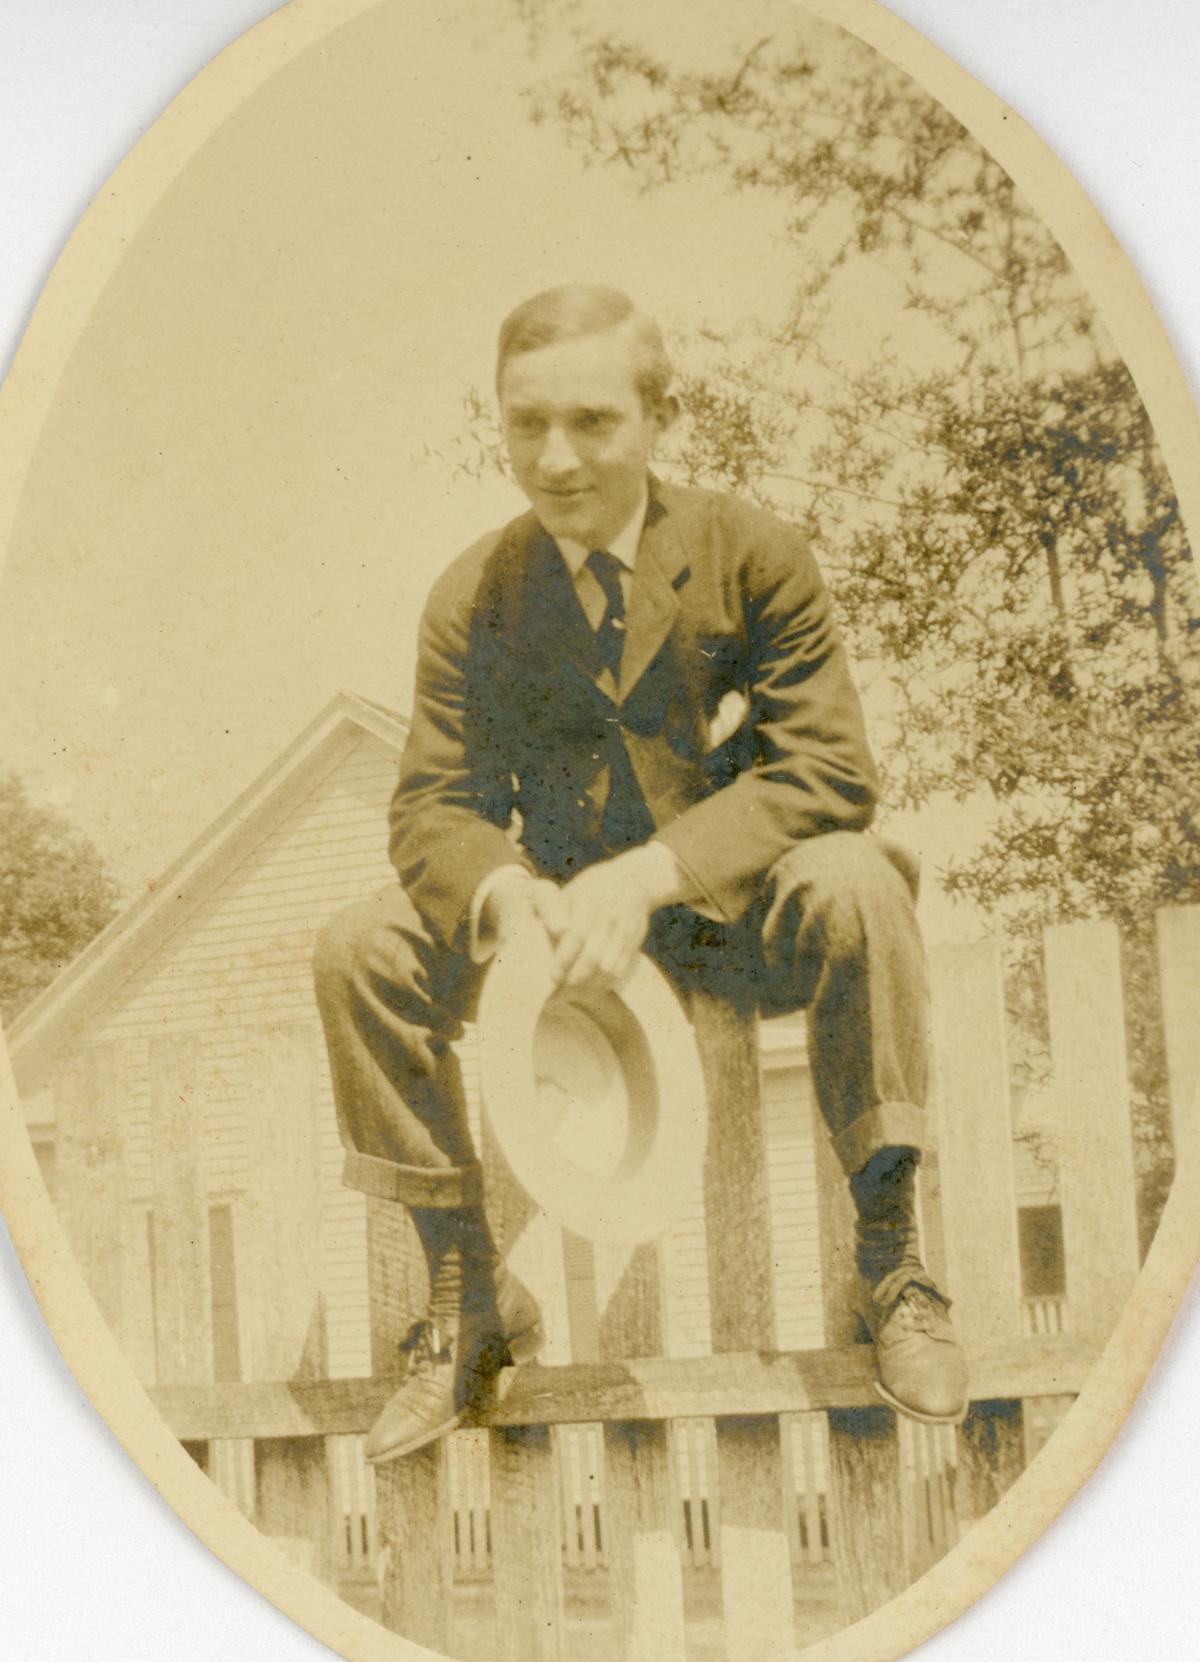 Unidentified man sitting on a fence in Lanark.